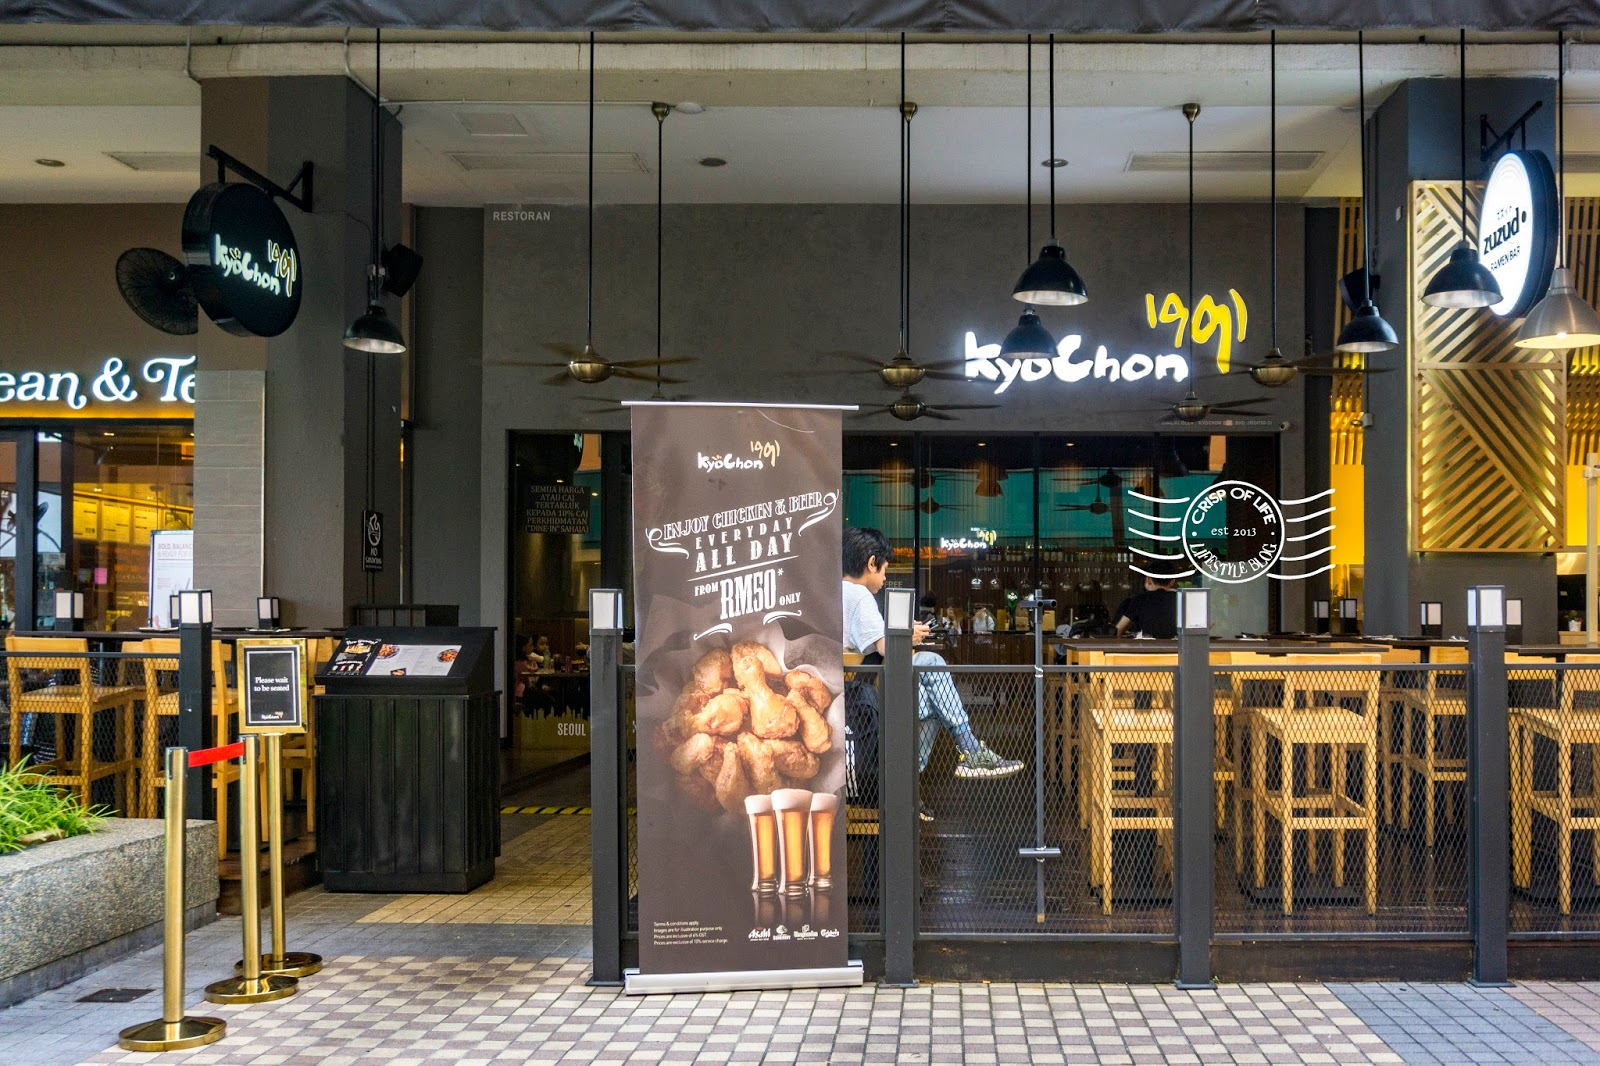 kyochon fried chicken penang gurney plaza G hotel